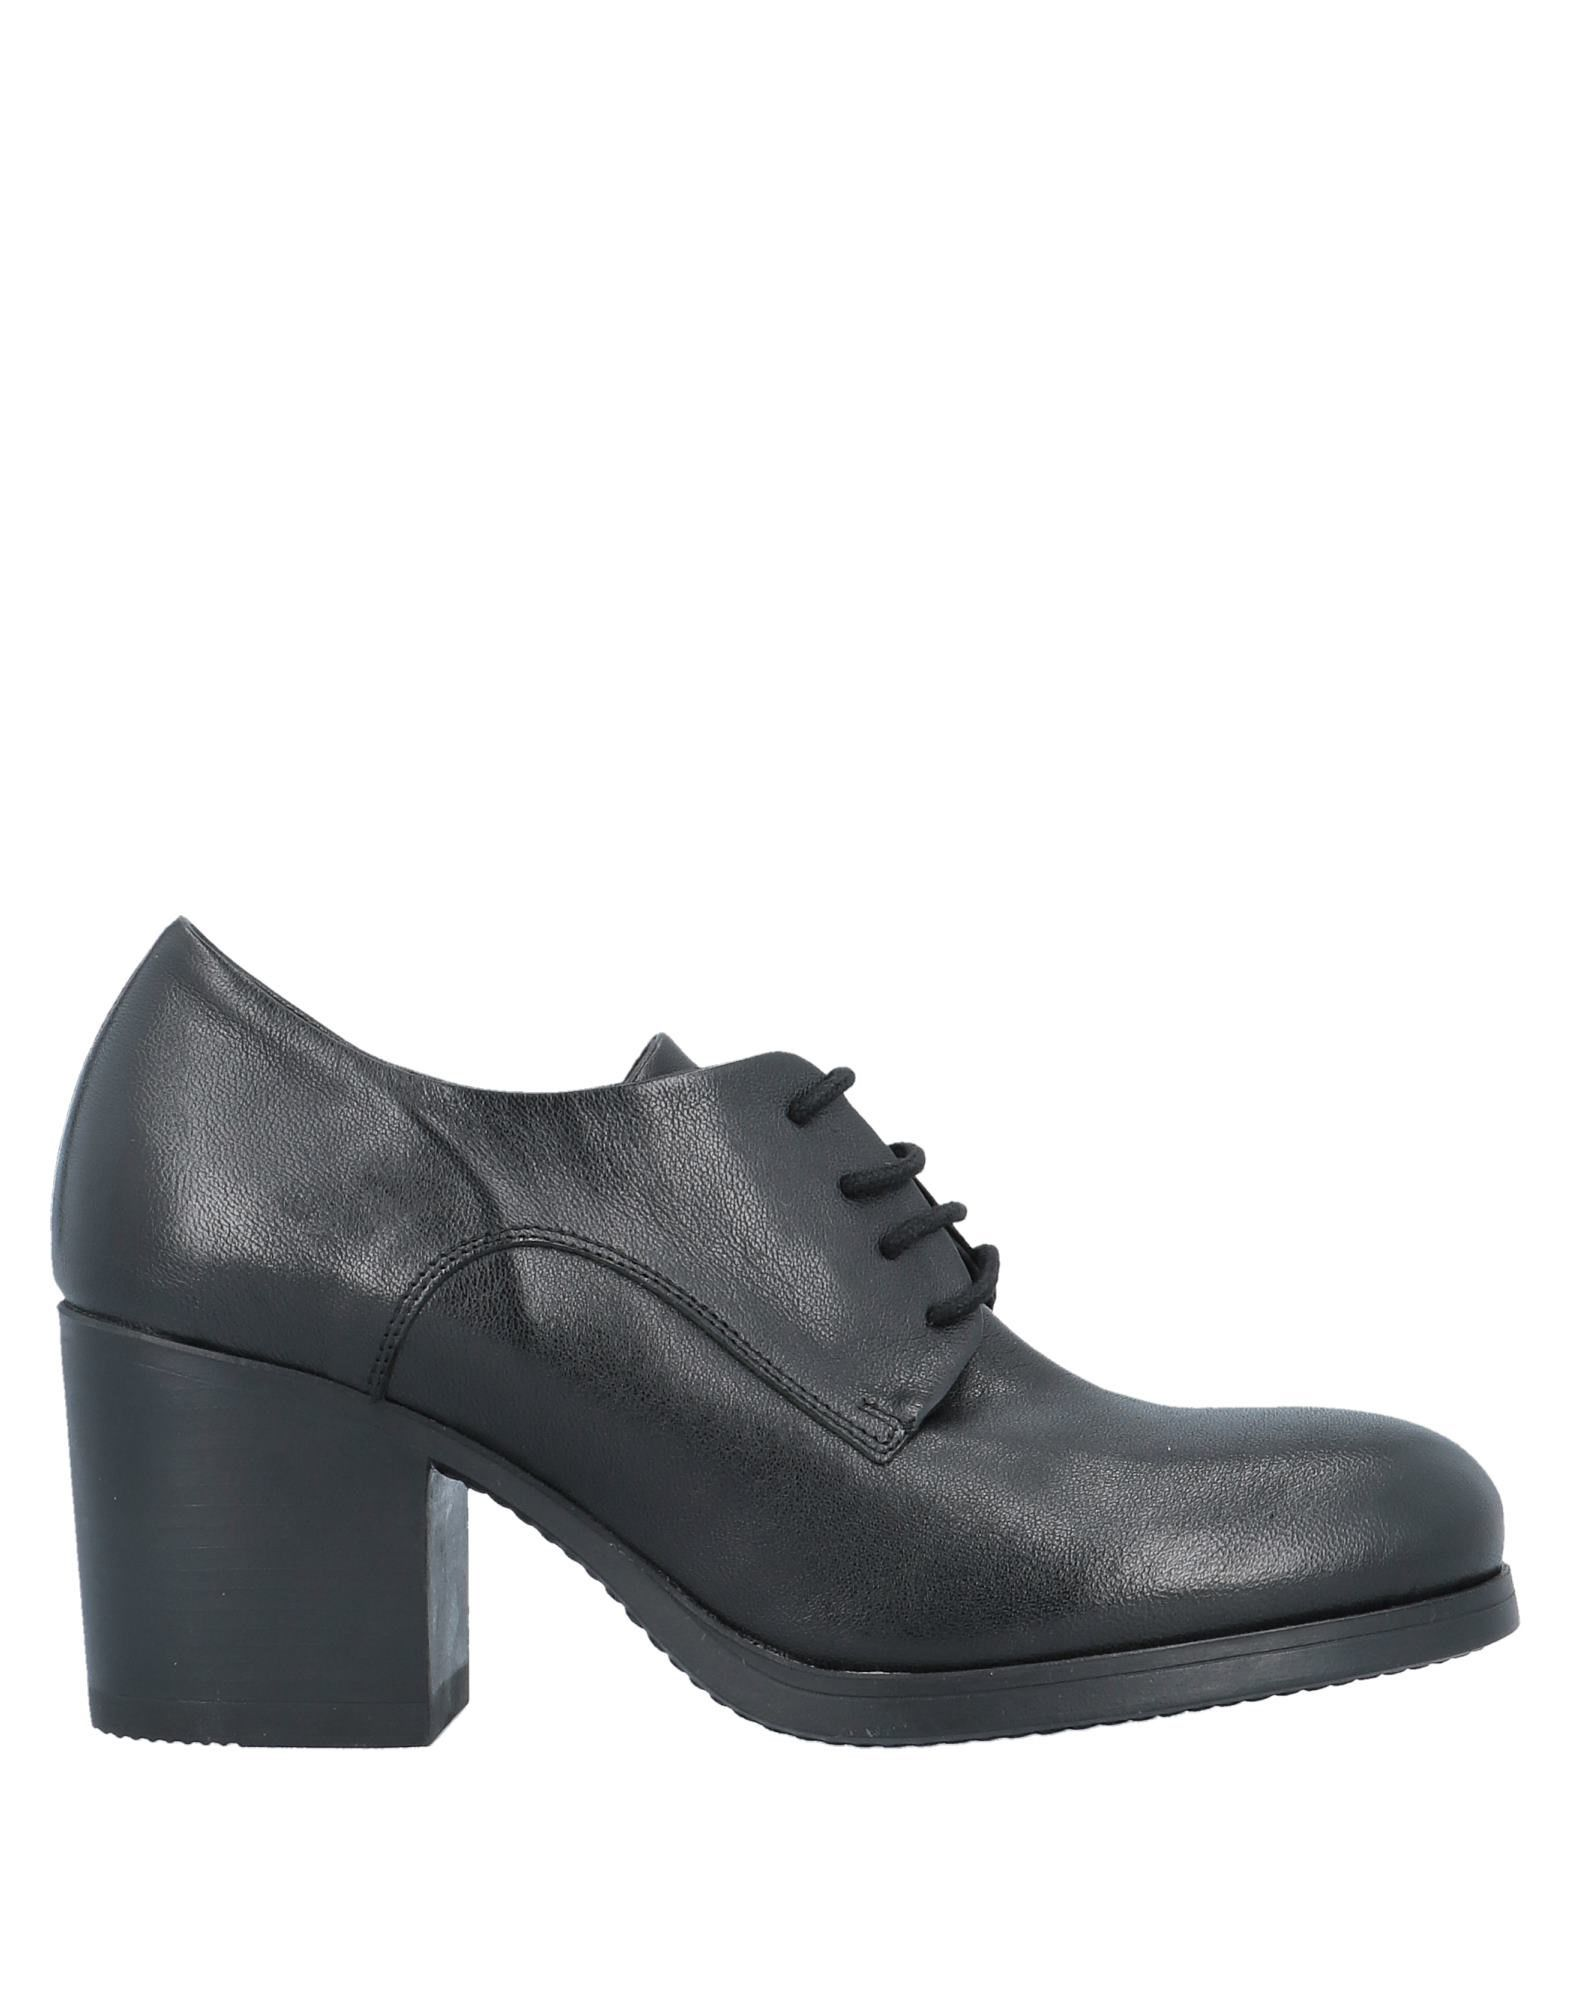 GIO+ Обувь на шнурках gio обувь на шнурках